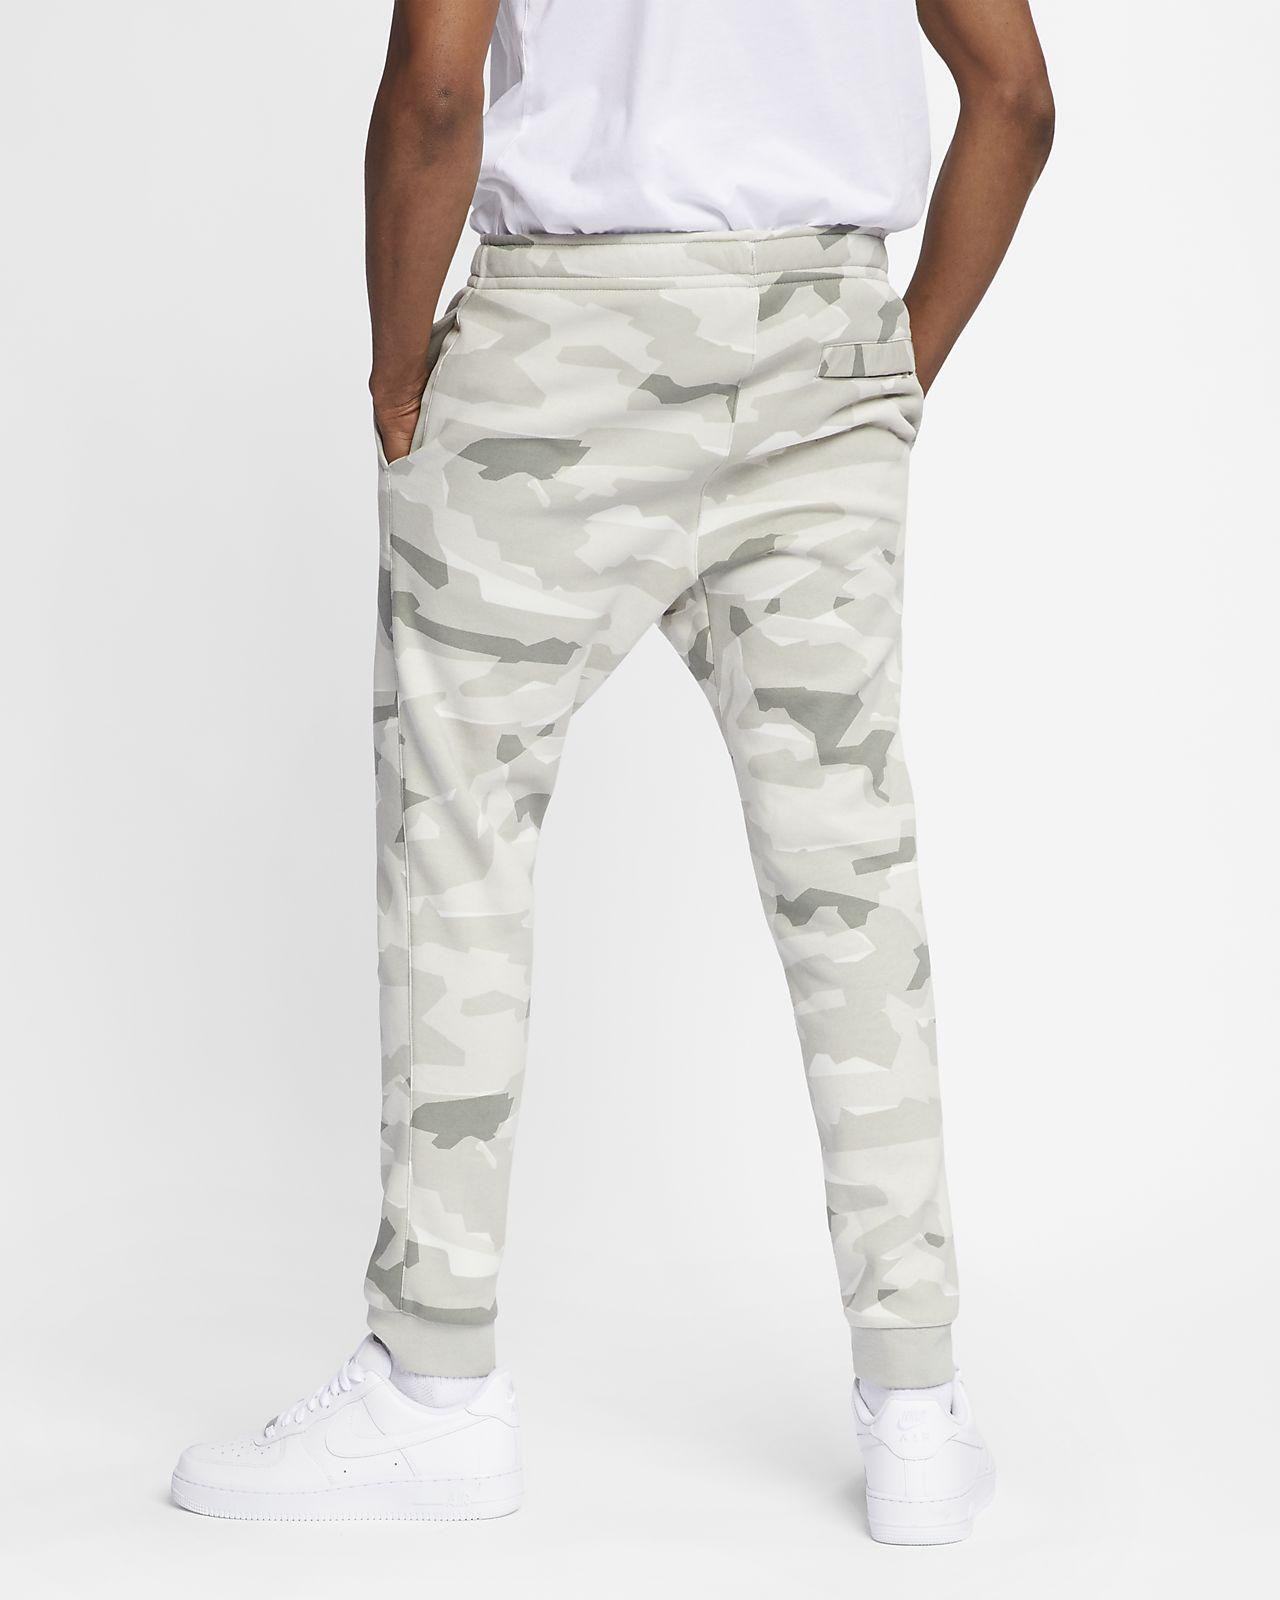 release date latest fashion new high Pantalon de jogging camouflage Nike Sportswear Club pour Homme